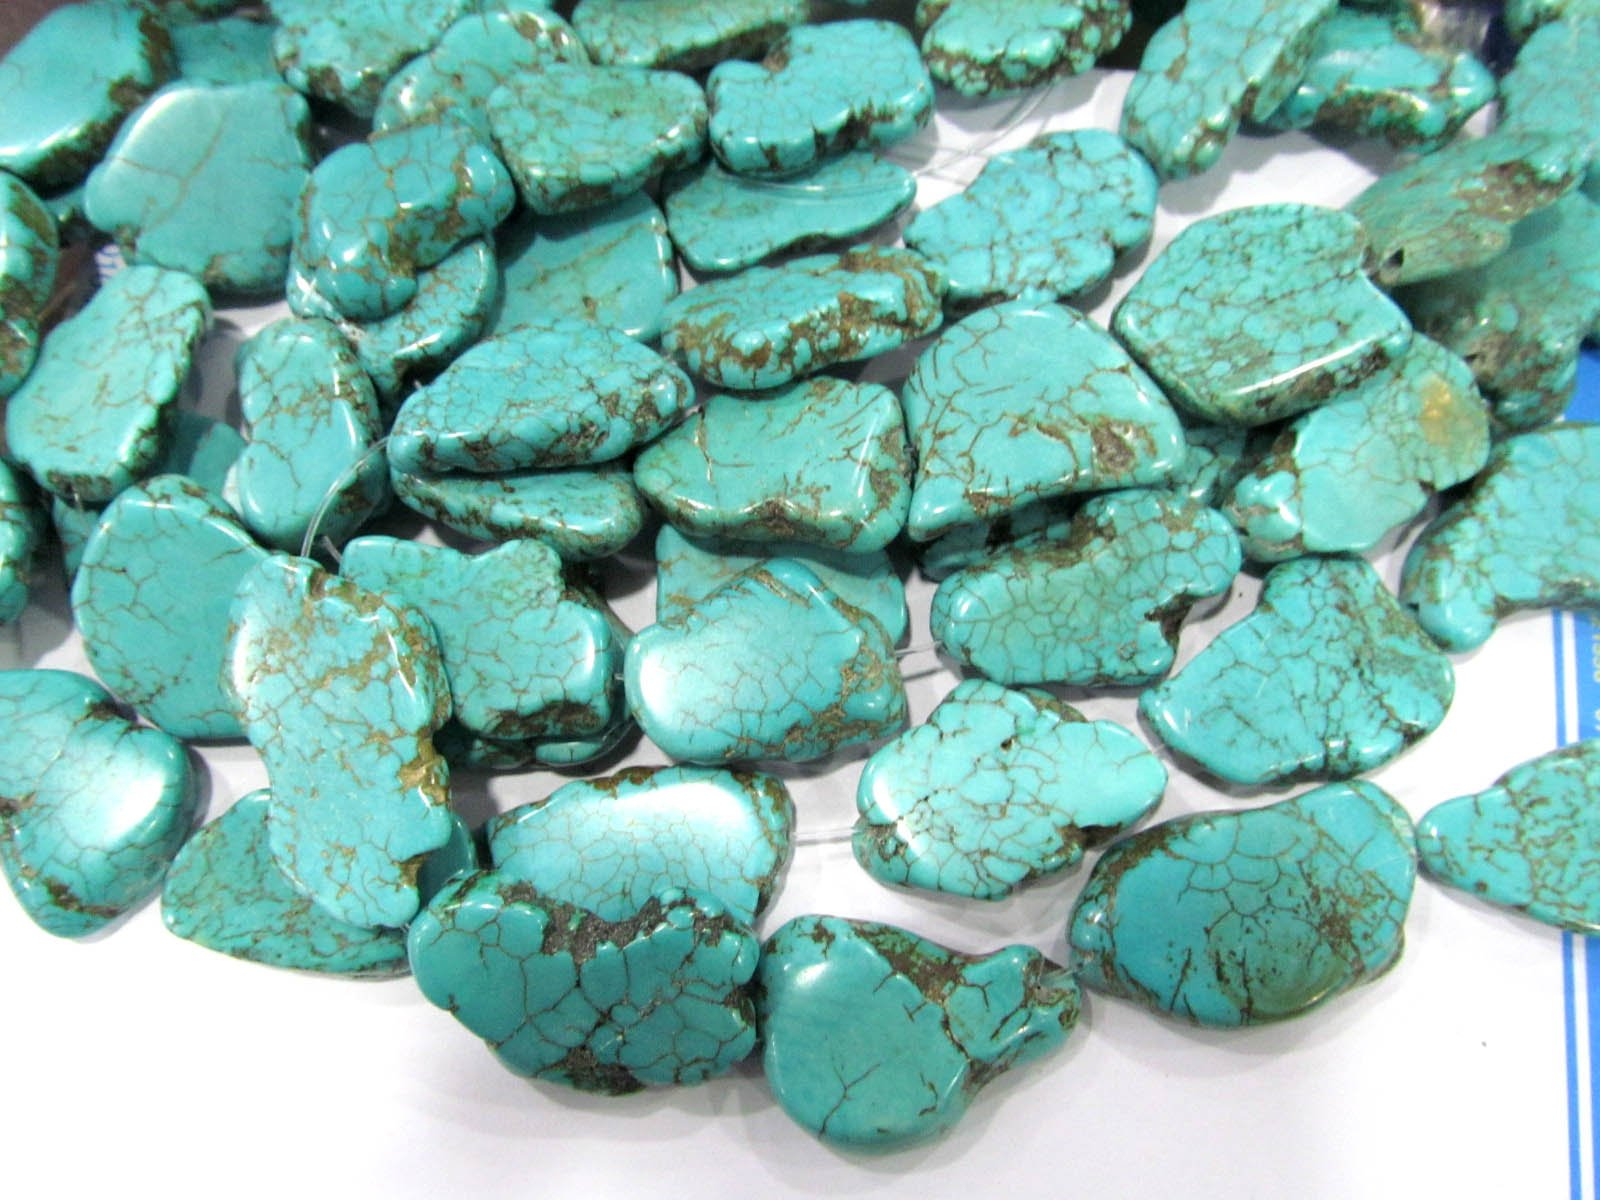 Turquoise Stone Slab Freeform green Blue white Turquoise beads blue Magnestie Slabs Turquoise Loose beads 20-40mm 16inch full strand